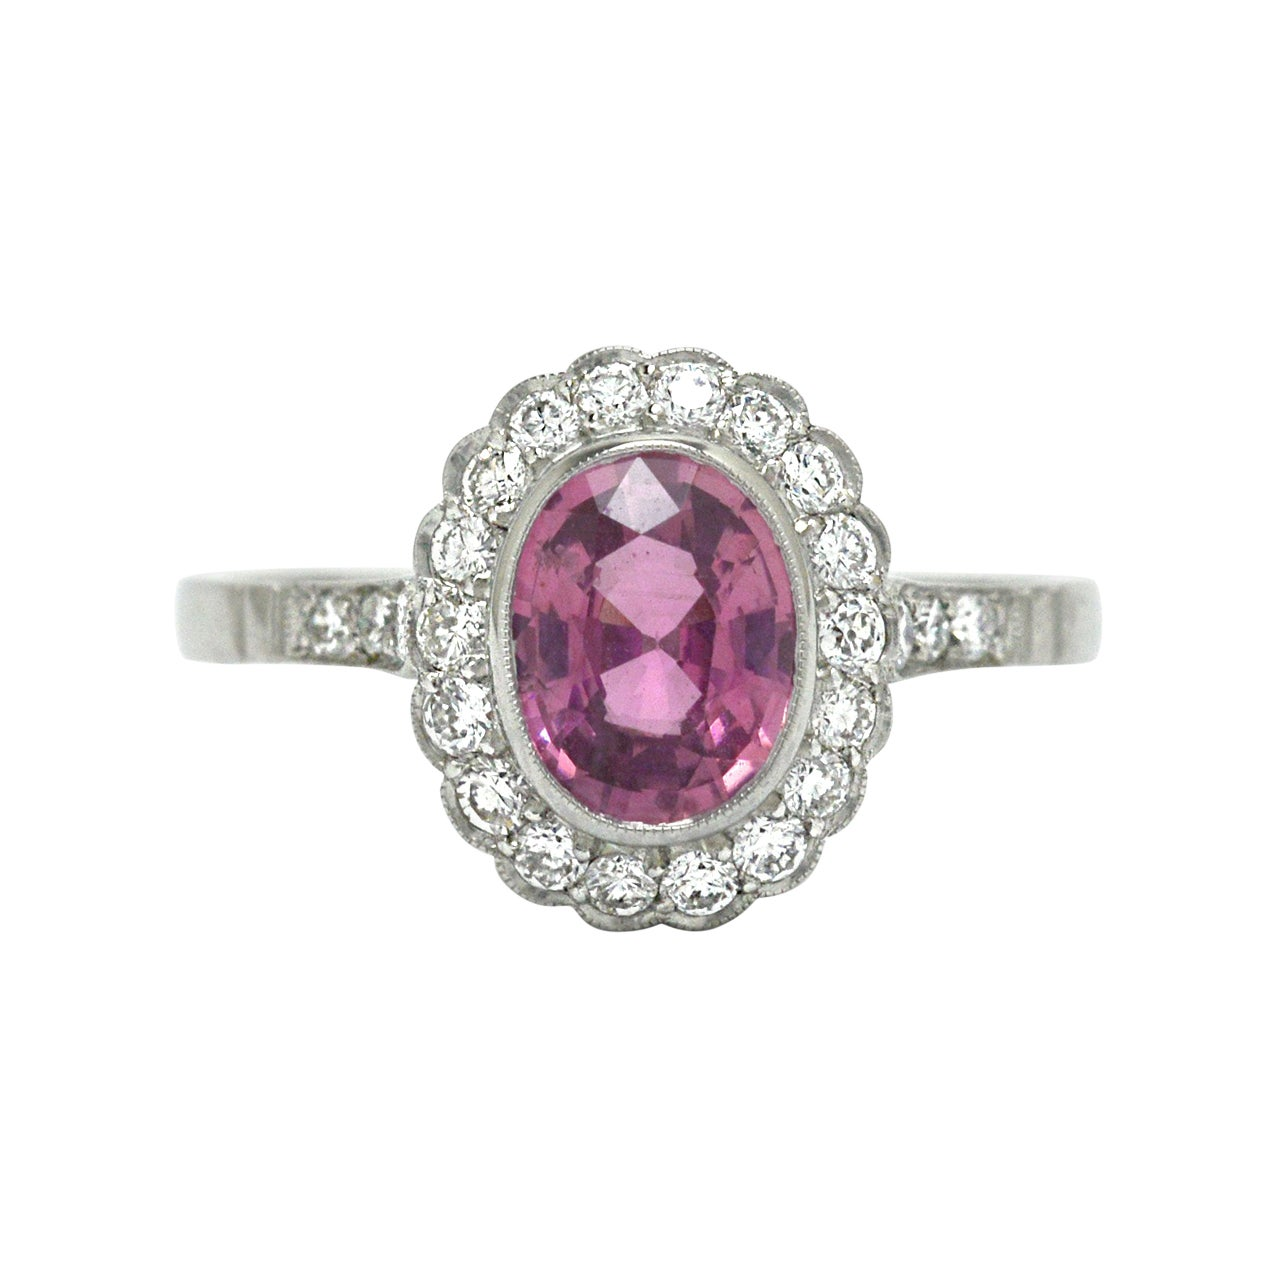 Pink Sapphire Engagement Ring Natural Diamond 2 Carat Halo Art Deco Style